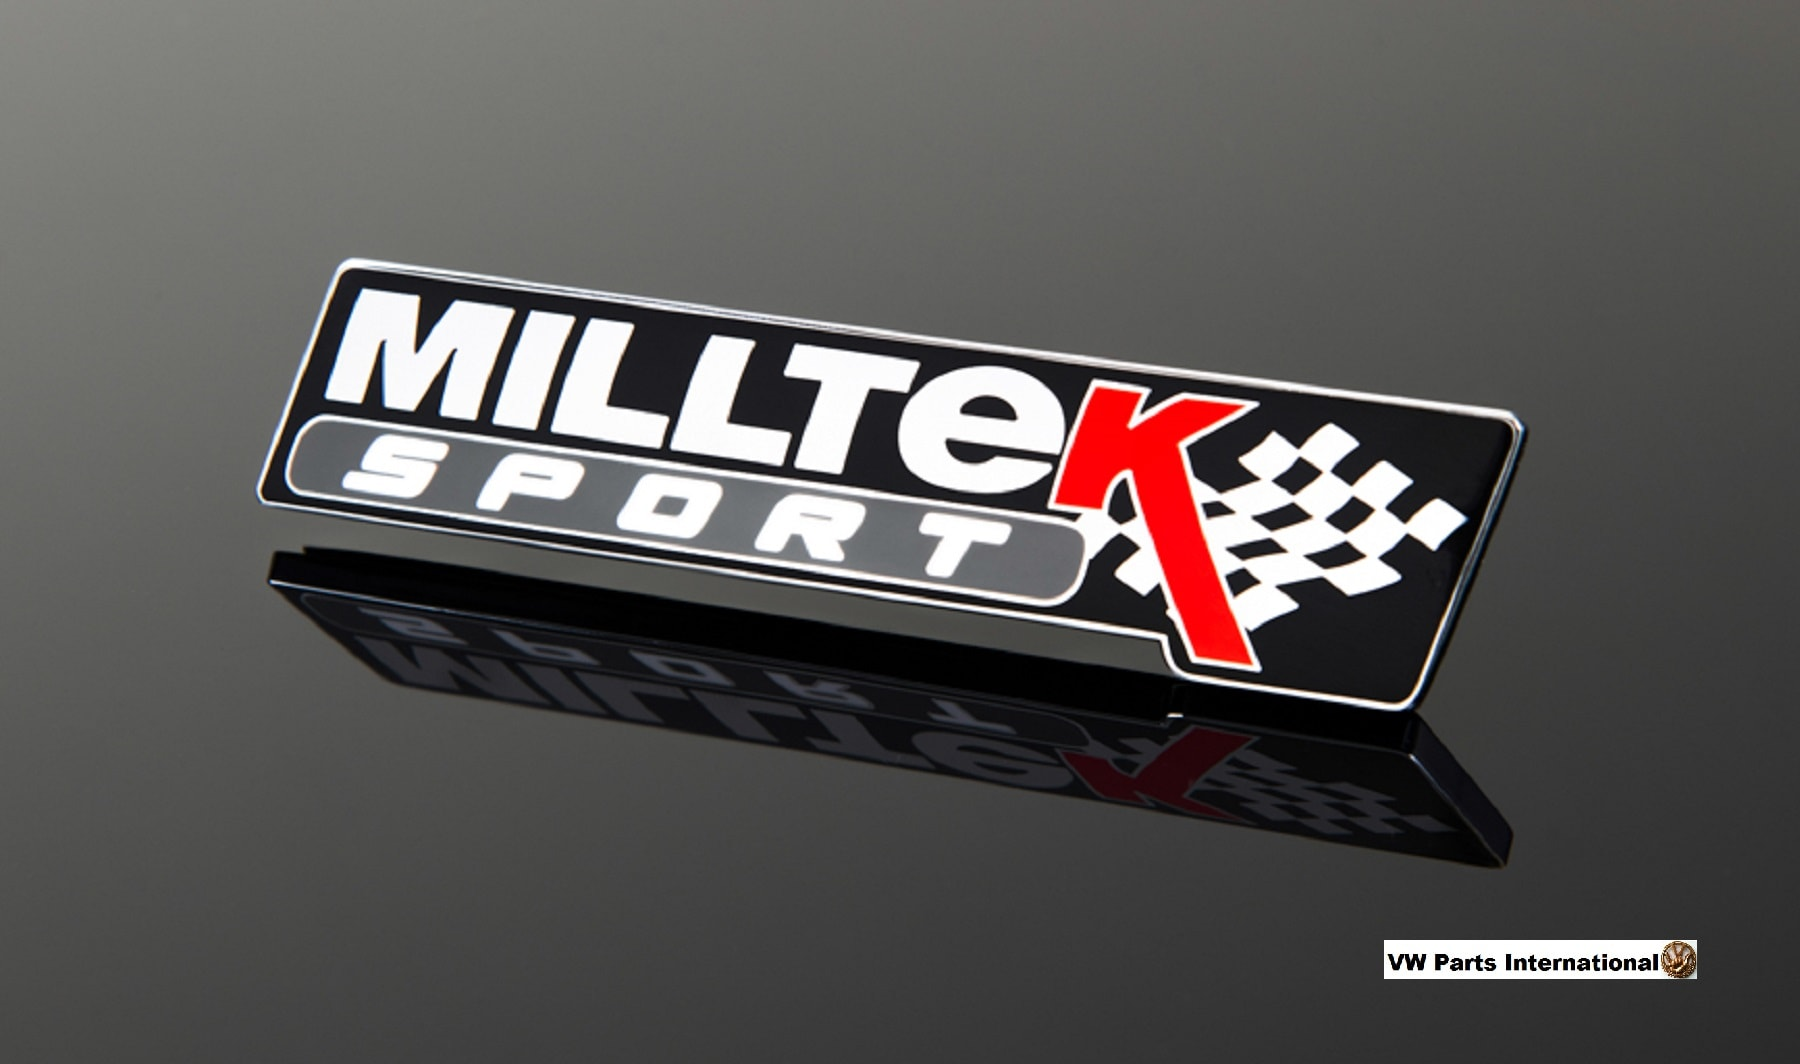 Official Milltek Sport Metal Badge 'Black Special Edition' Emblem Plaque VW Audi Seat Skoda R R32 TSI TFSI TDI